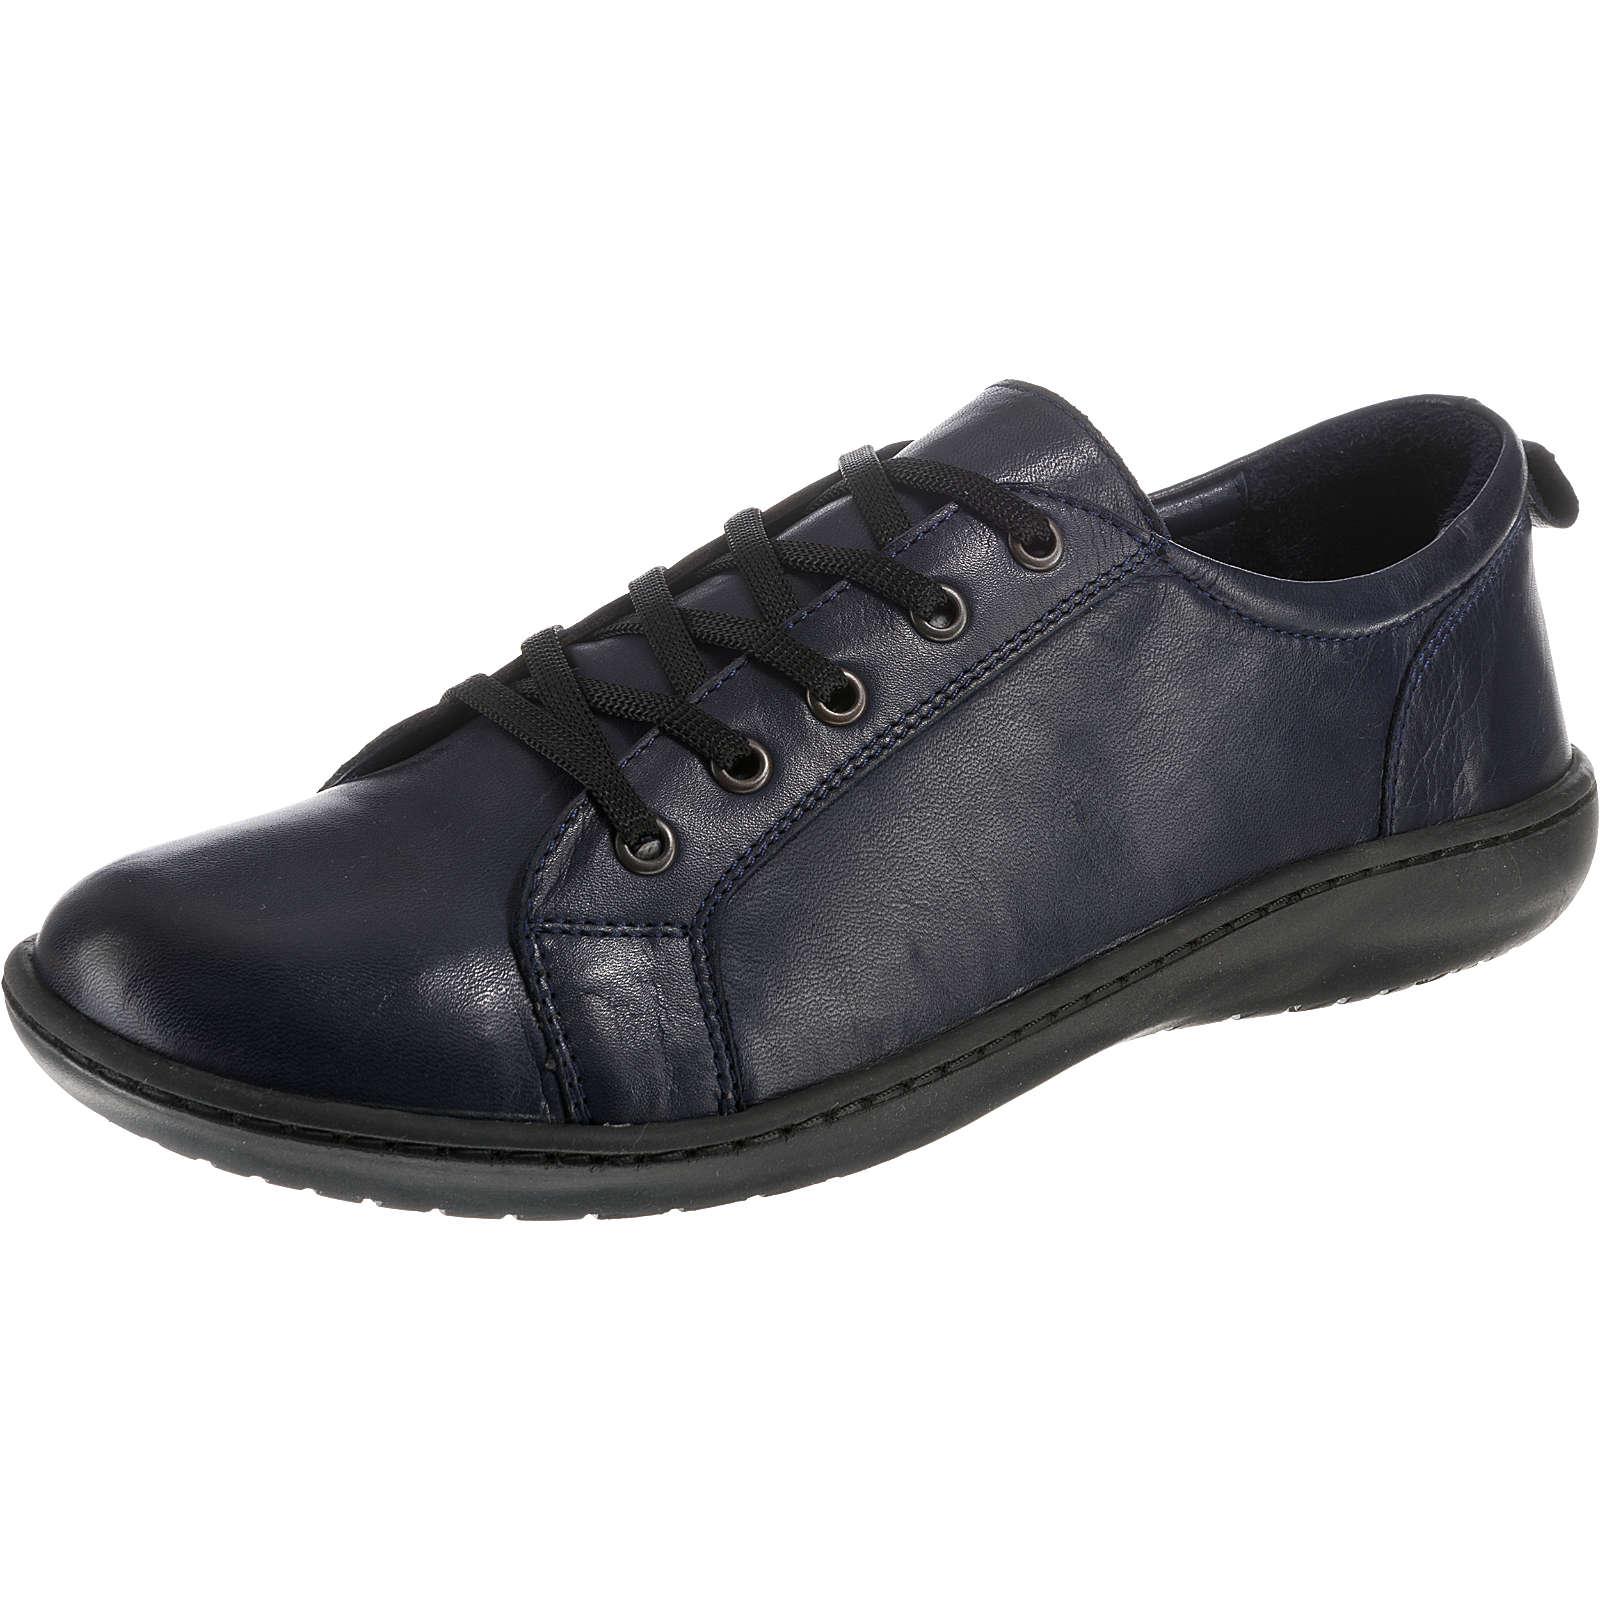 Andrea Conti Sneakers Low dunkelblau Damen Gr. 37